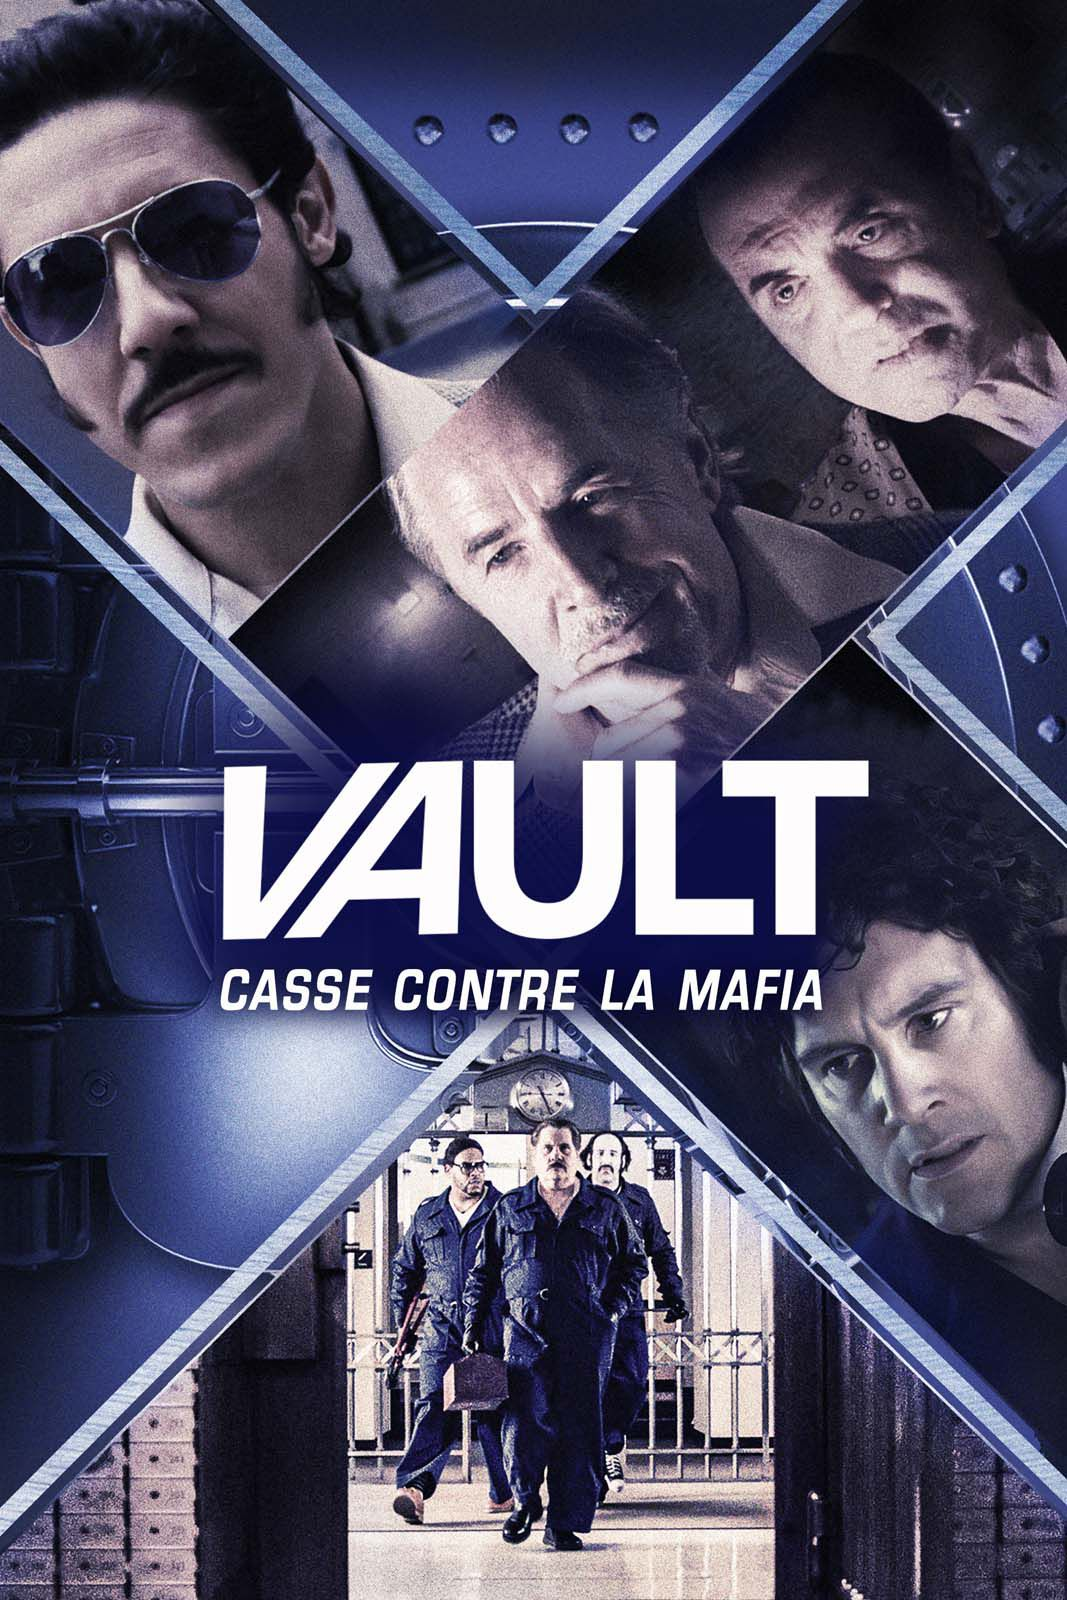 Vault - Casse contre la mafia - Film (2019)